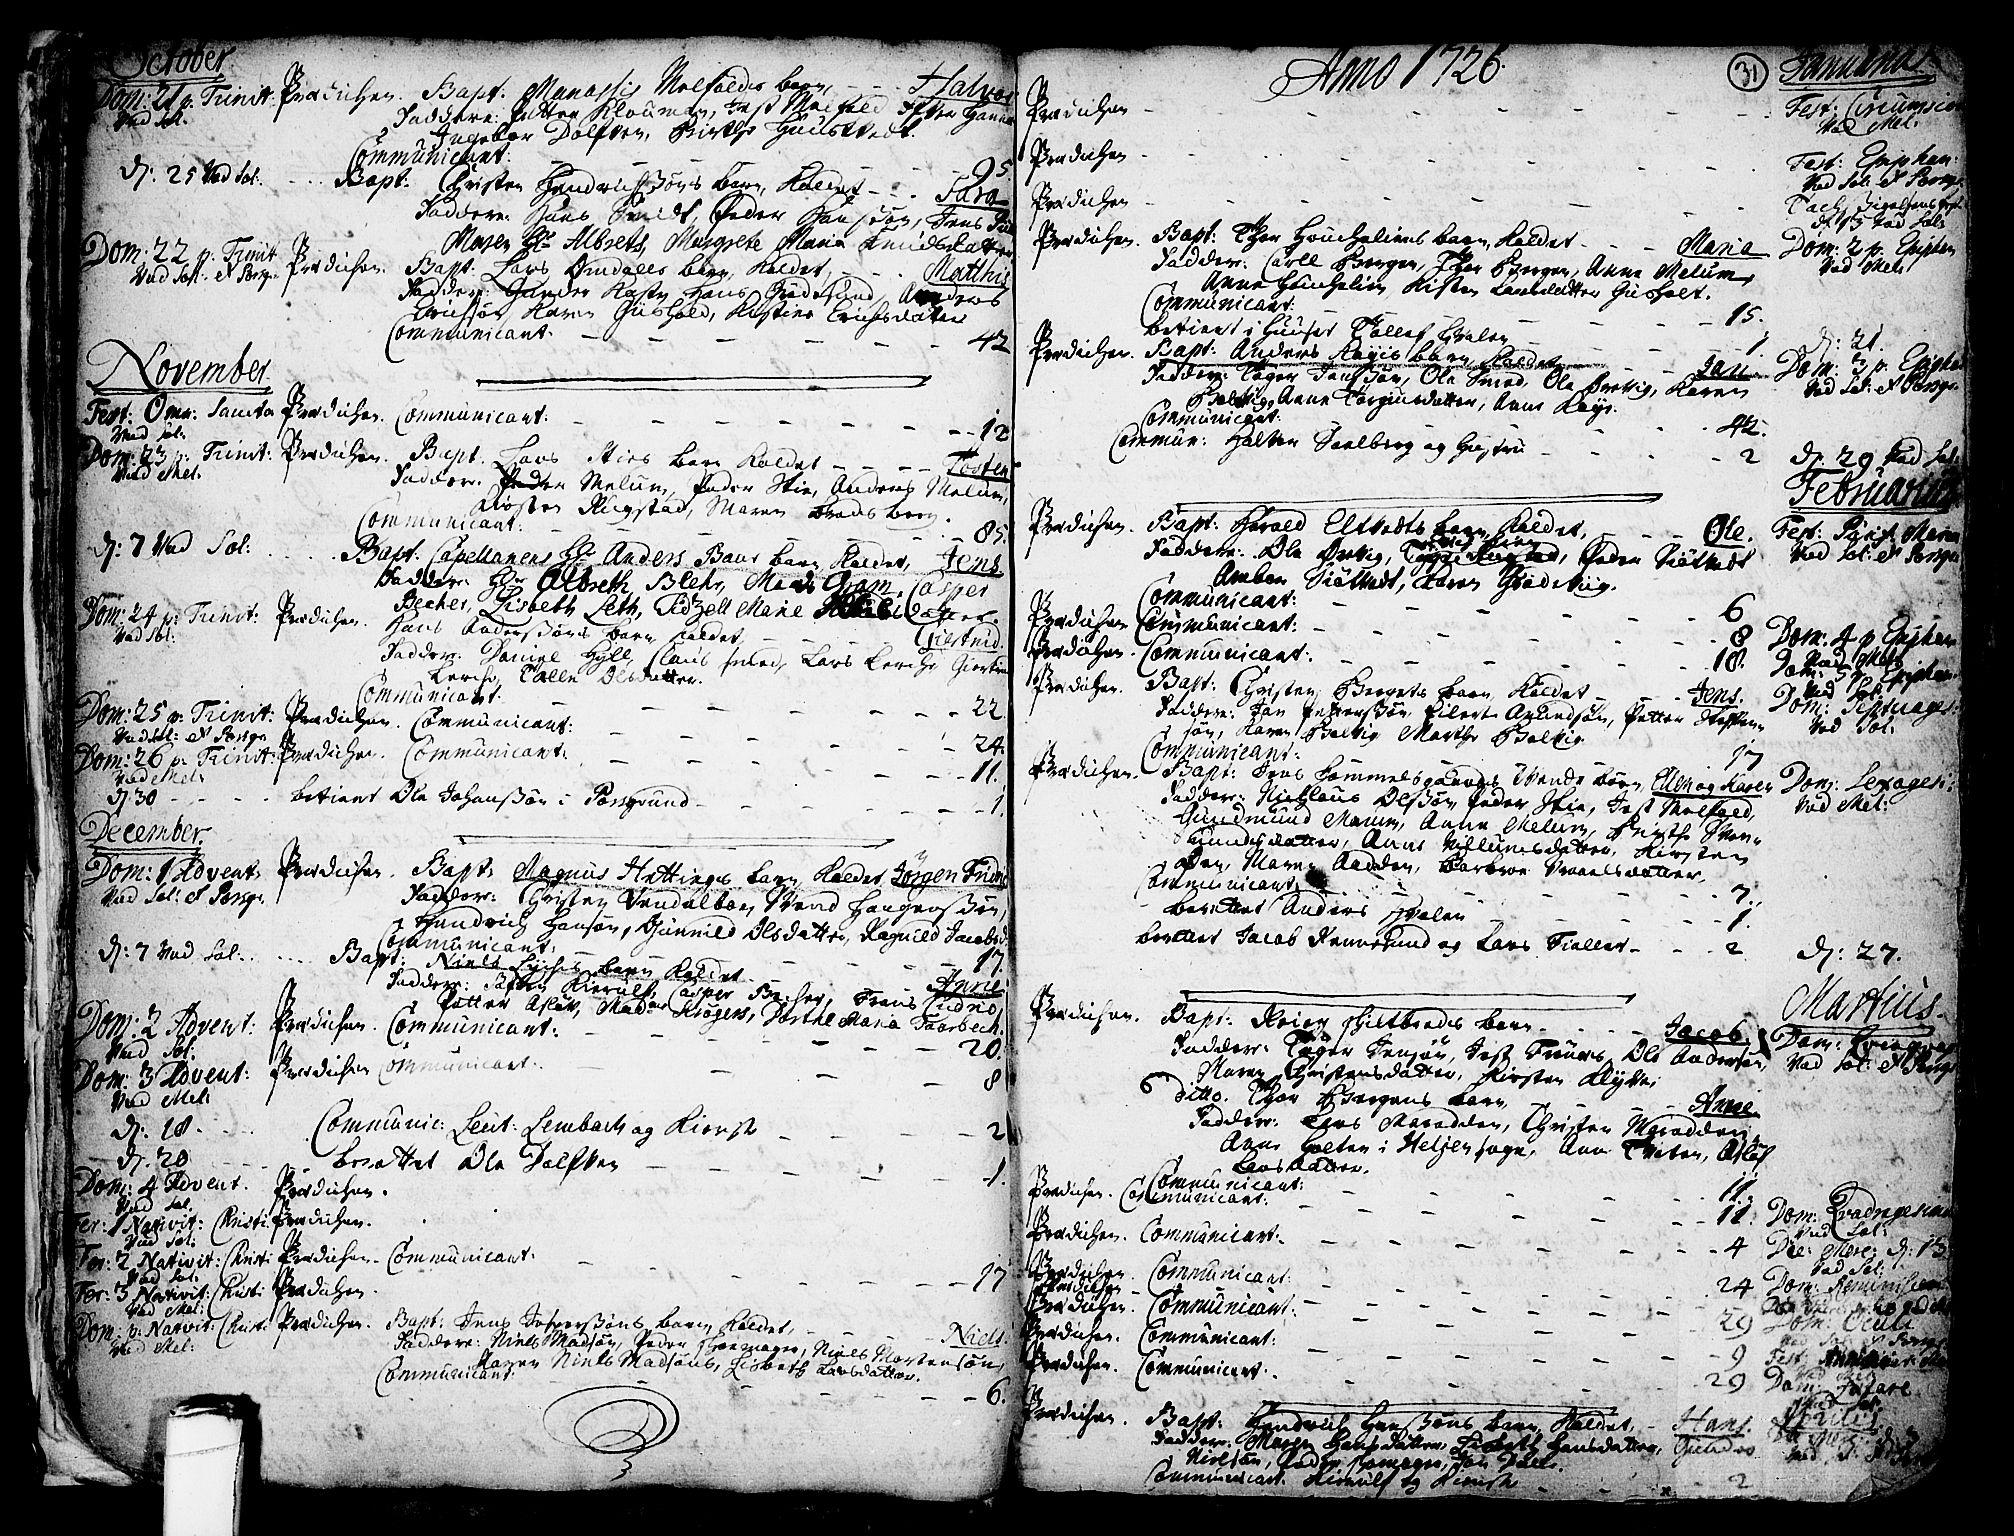 SAKO, Solum kirkebøker, F/Fa/L0002: Ministerialbok nr. I 2, 1713-1761, s. 31